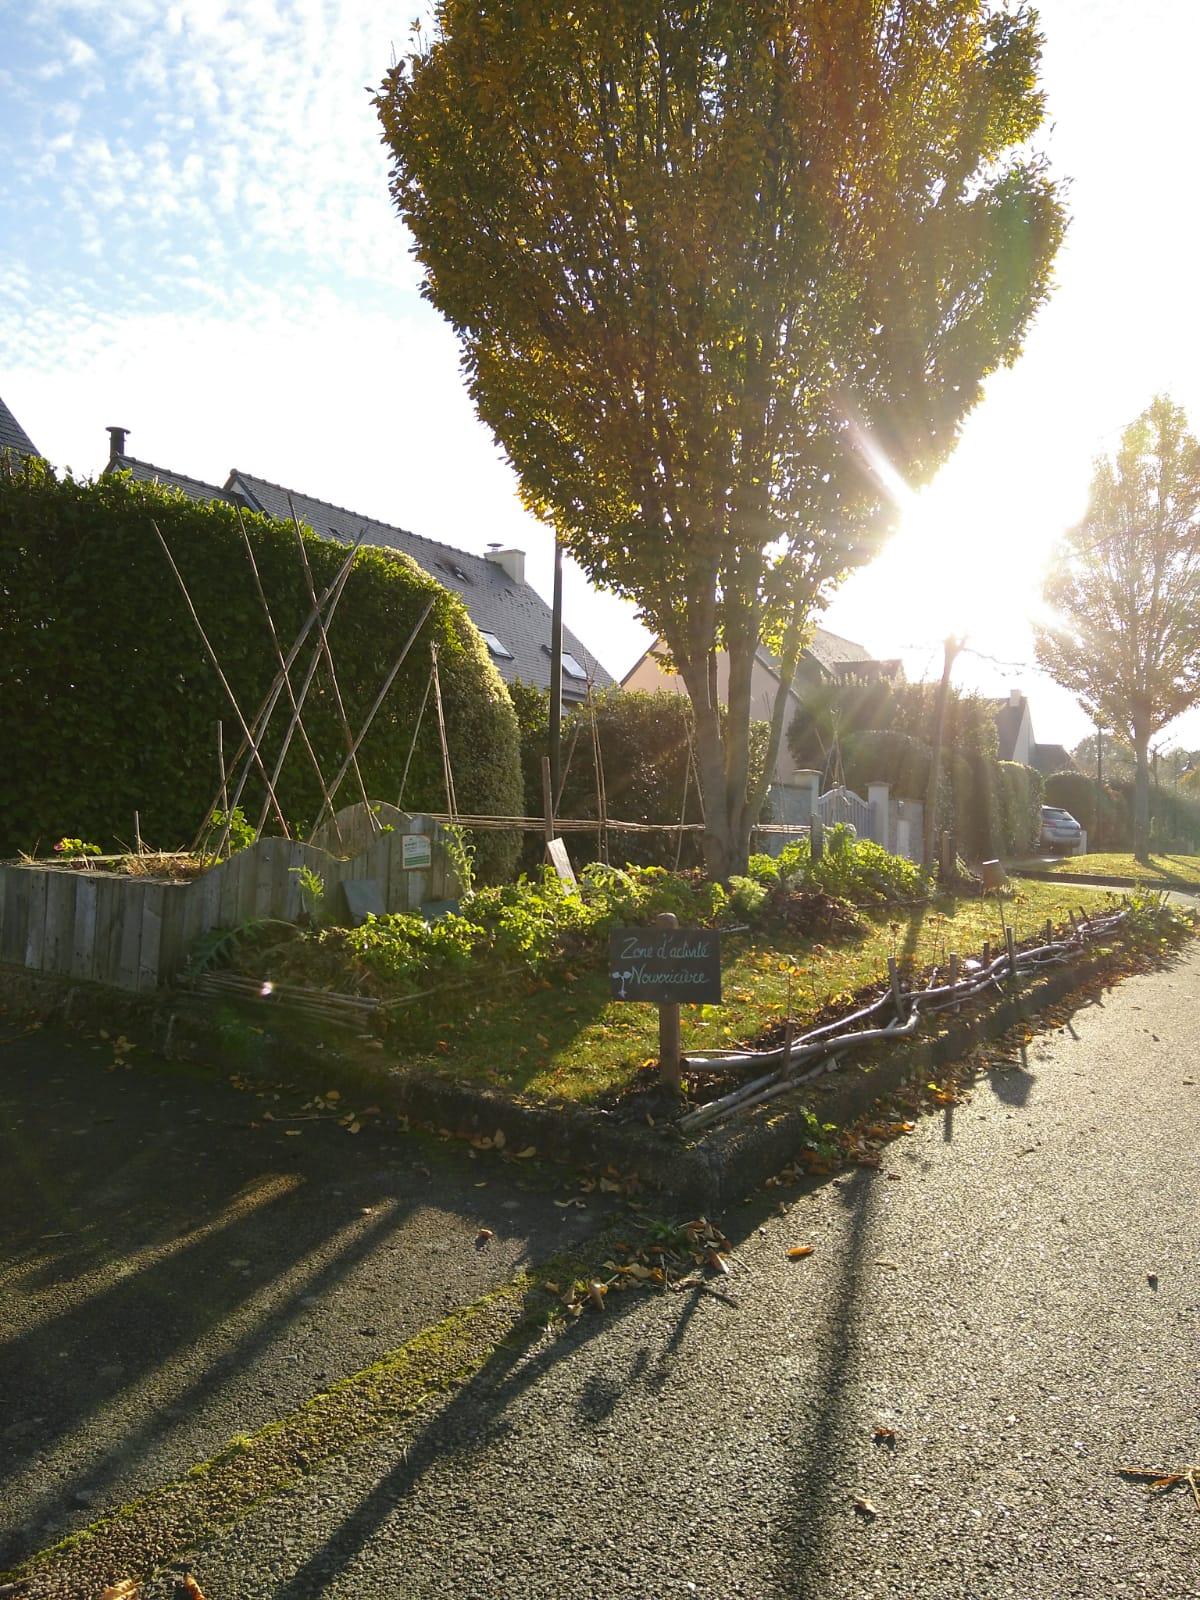 ZAN 3 - vue ensemble sous le soleil